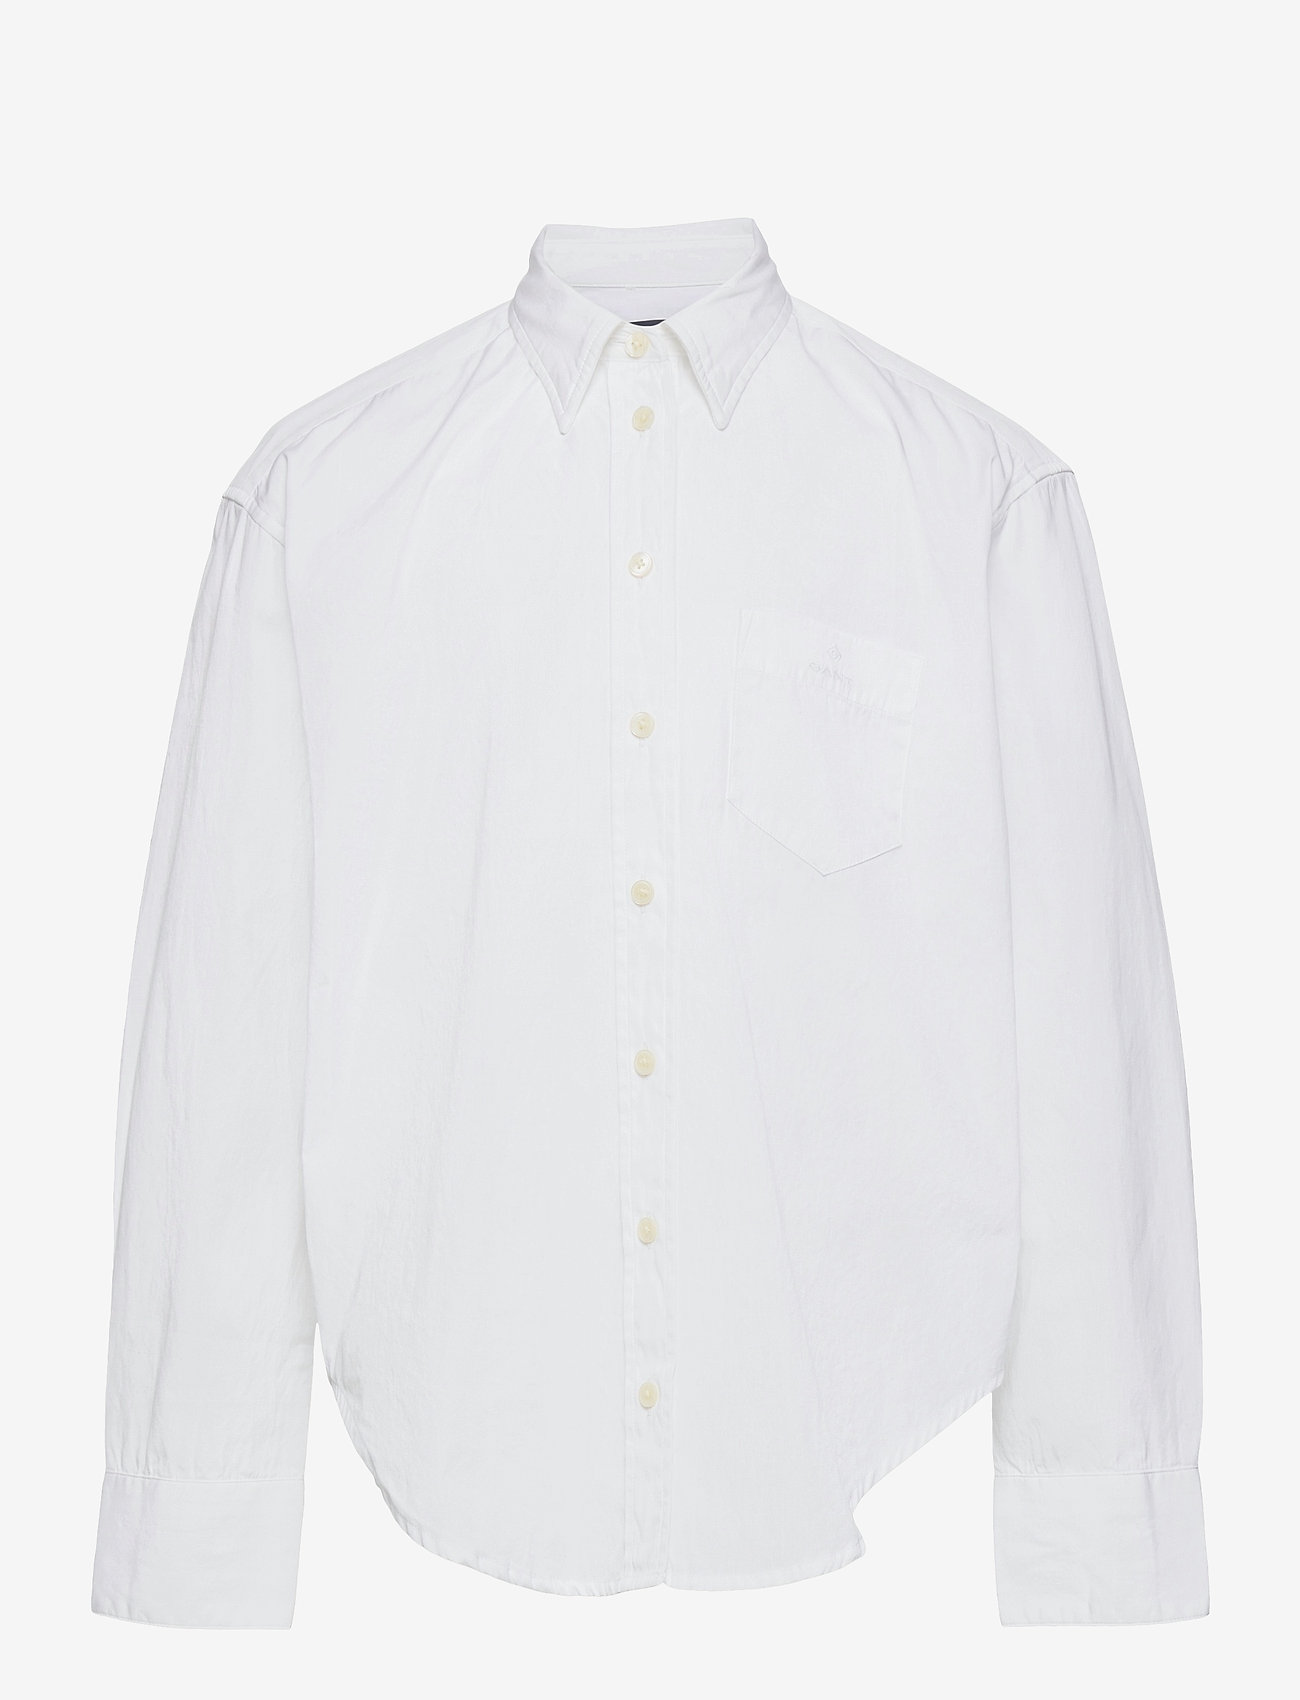 GANT - D1. OVERSIZED POPLIN SHIRT - shirts - white - 0